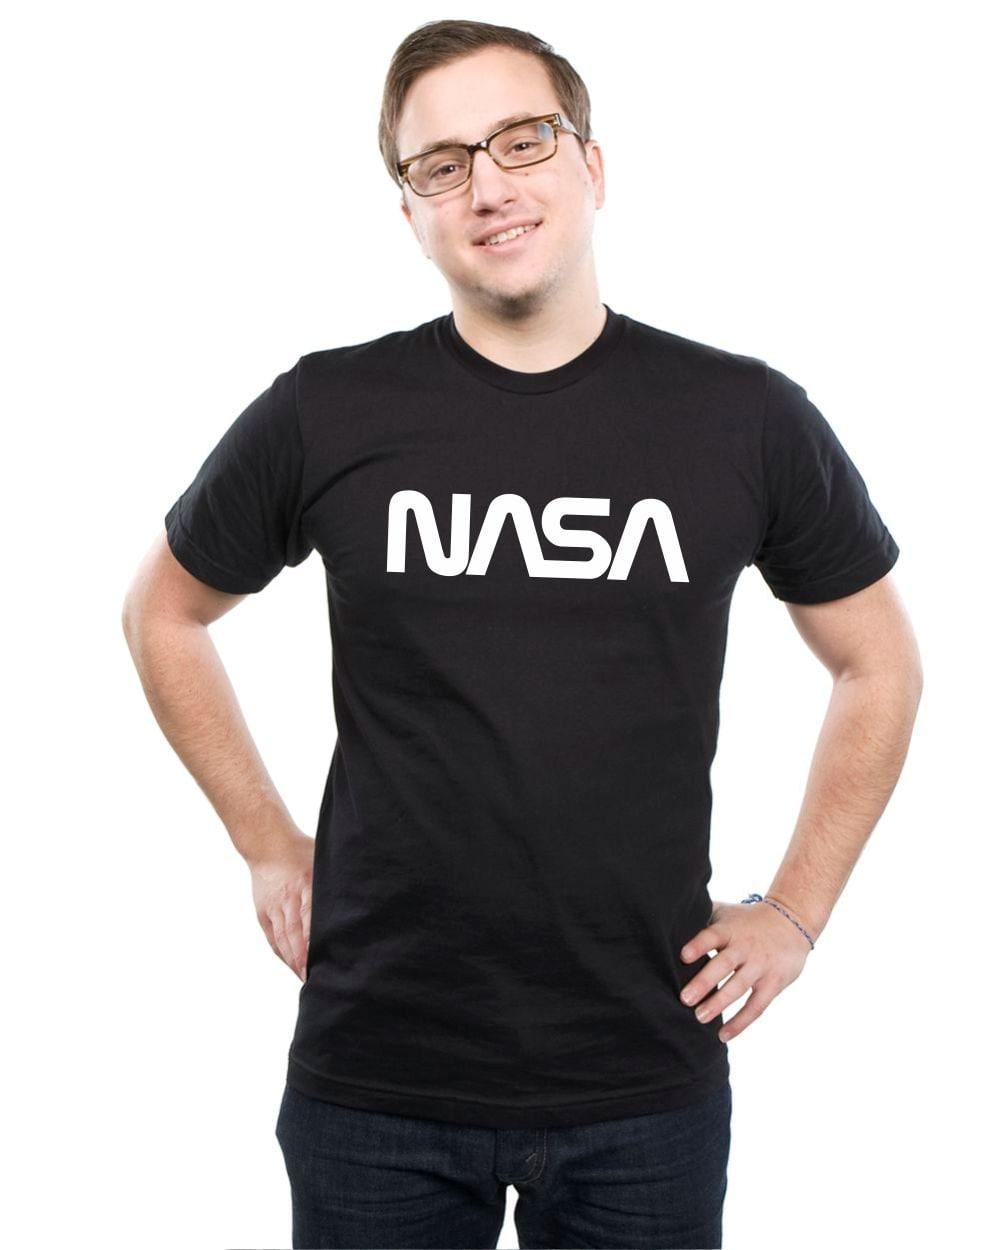 SPACE X ELON MUSK NASA T SHIRT Adults Unisex KidS ALL SIZES SPORT TEE ToPs W